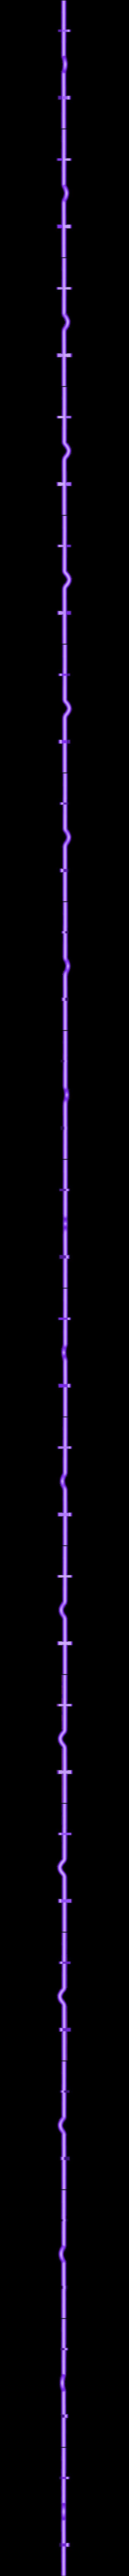 linkbarrear.stl Download STL file 34' Ford Pickup Hot Rod • 3D printing object, macone1